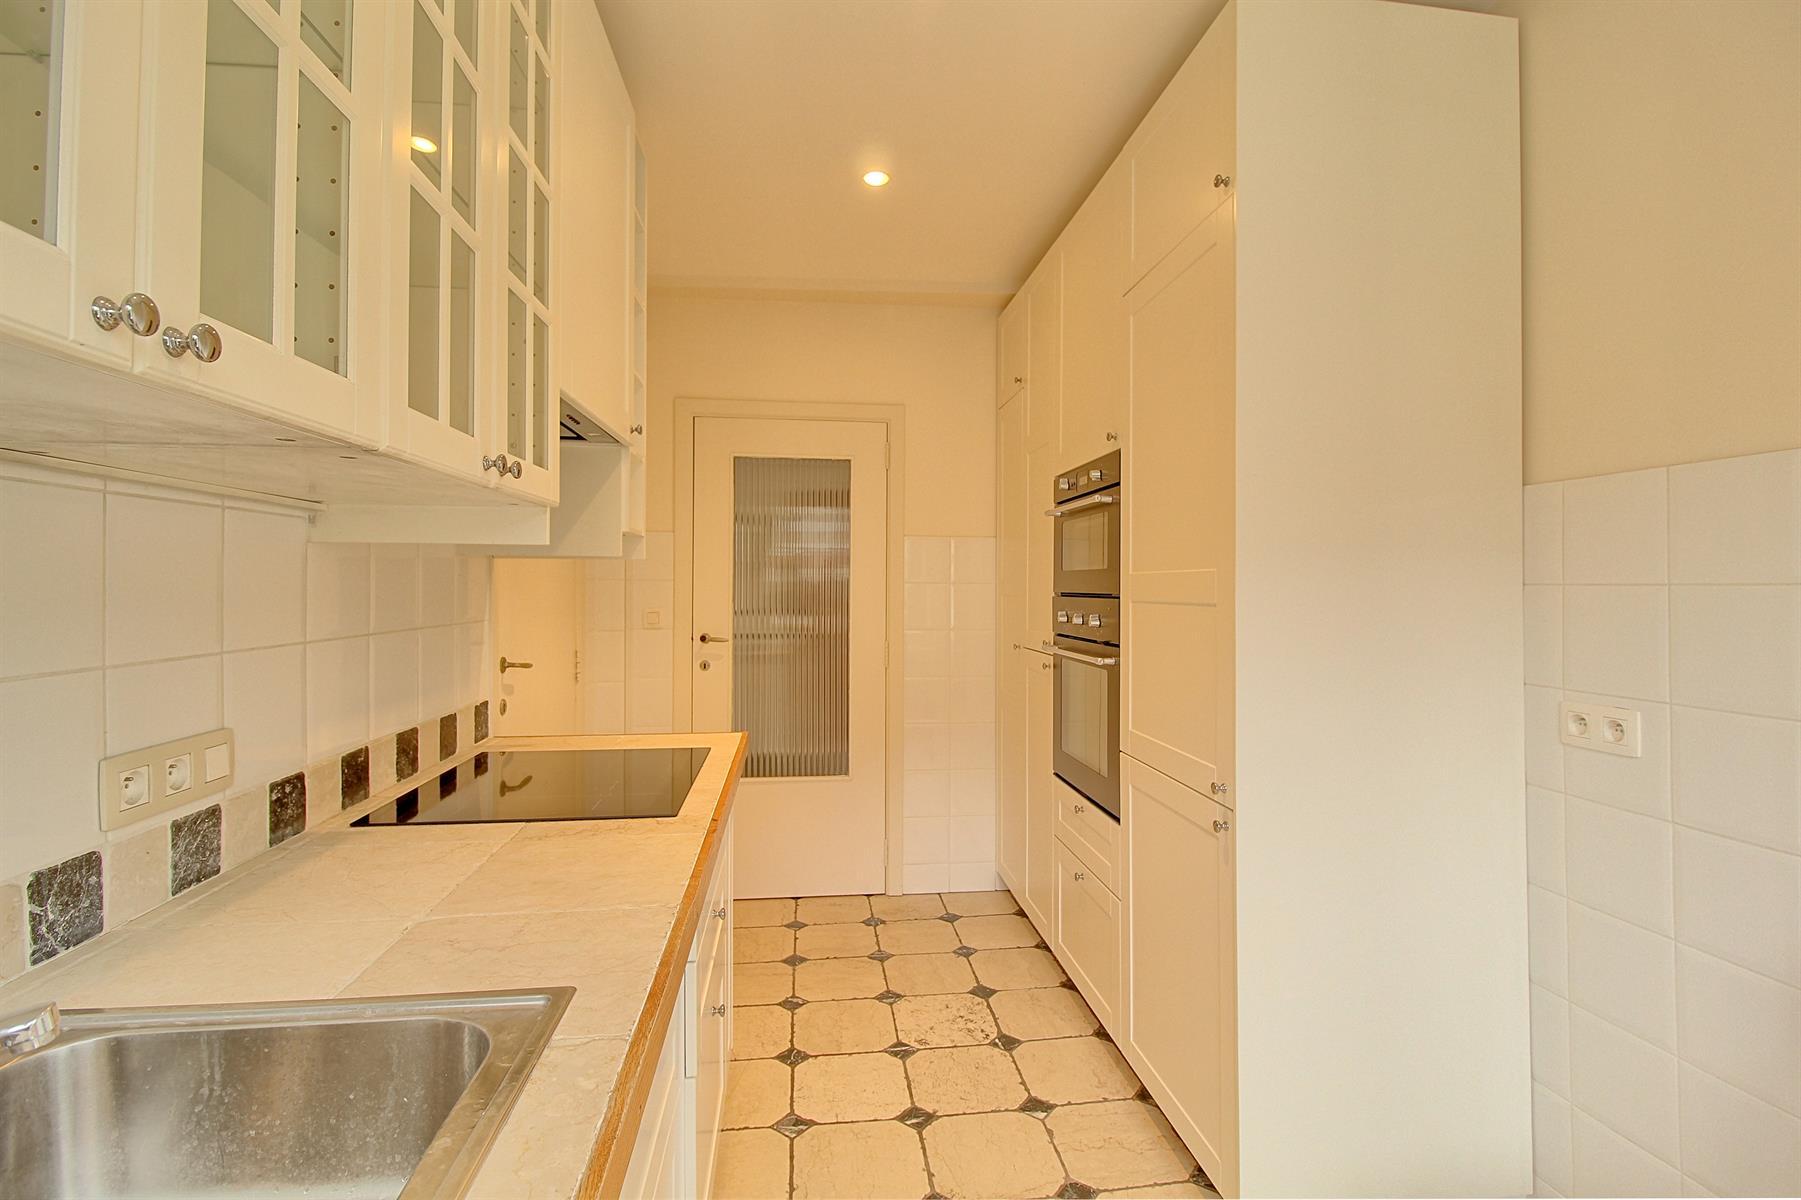 Appartement - Woluwe-Saint-Lambert - #4169126-2